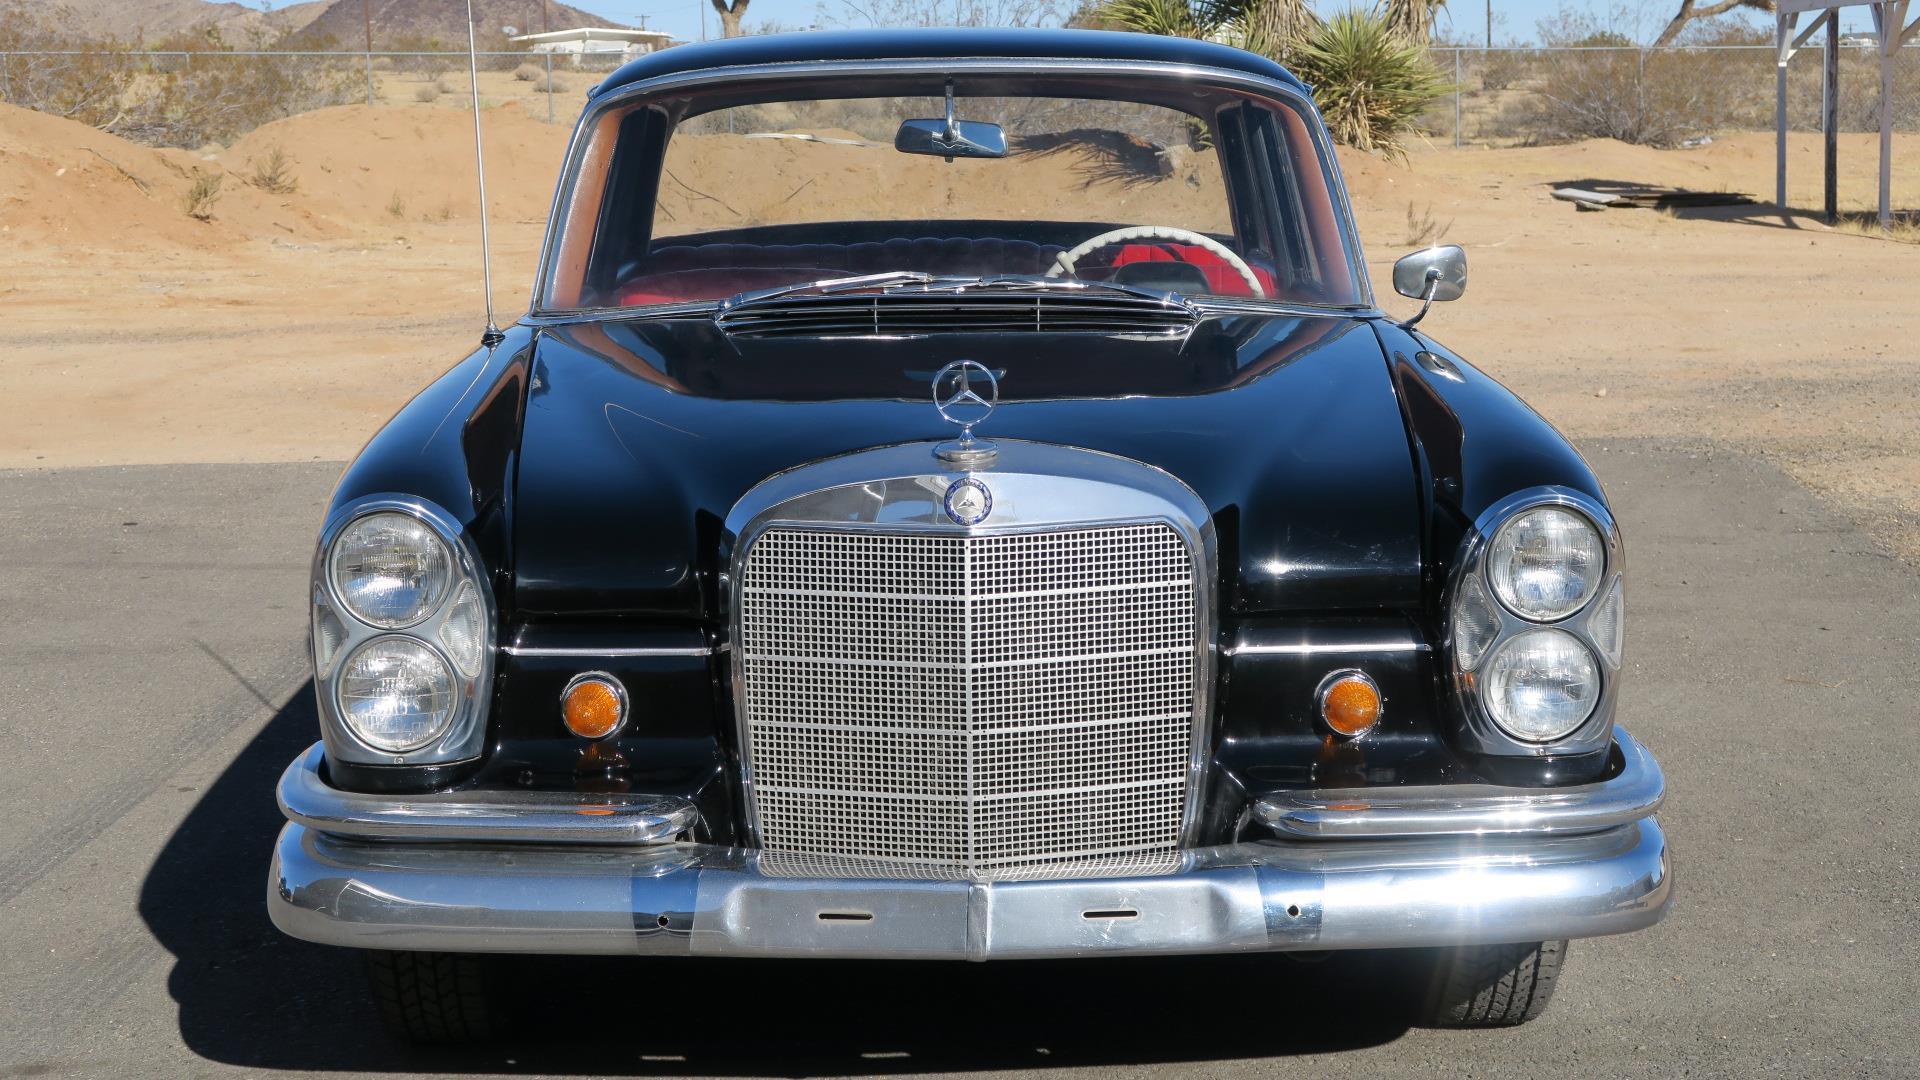 1963 mercedes benz 220s 64k original miles rare for 1963 mercedes benz